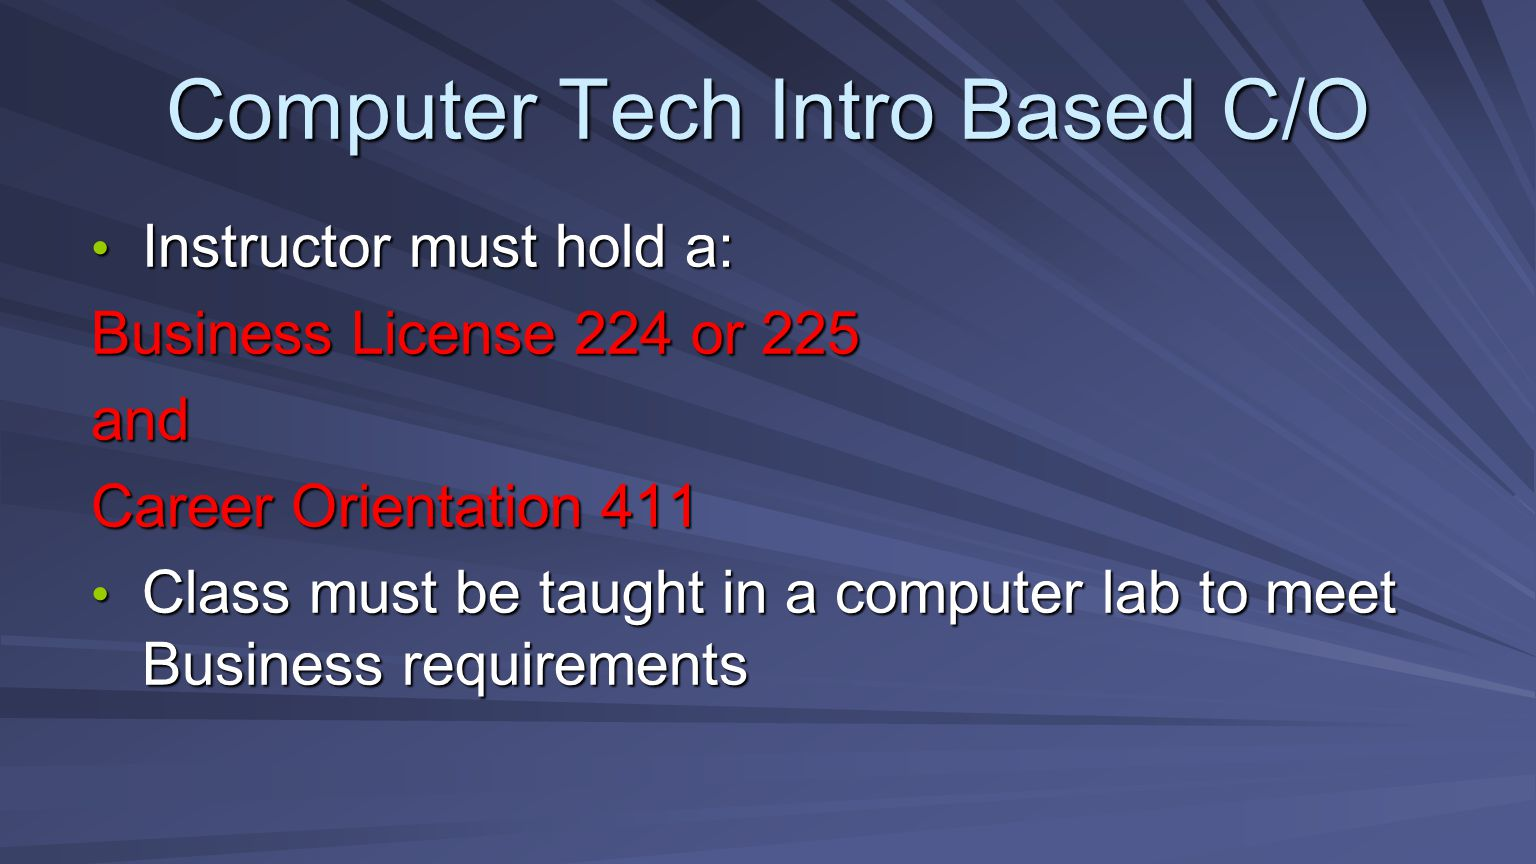 Computer Tech Intro Based C/O